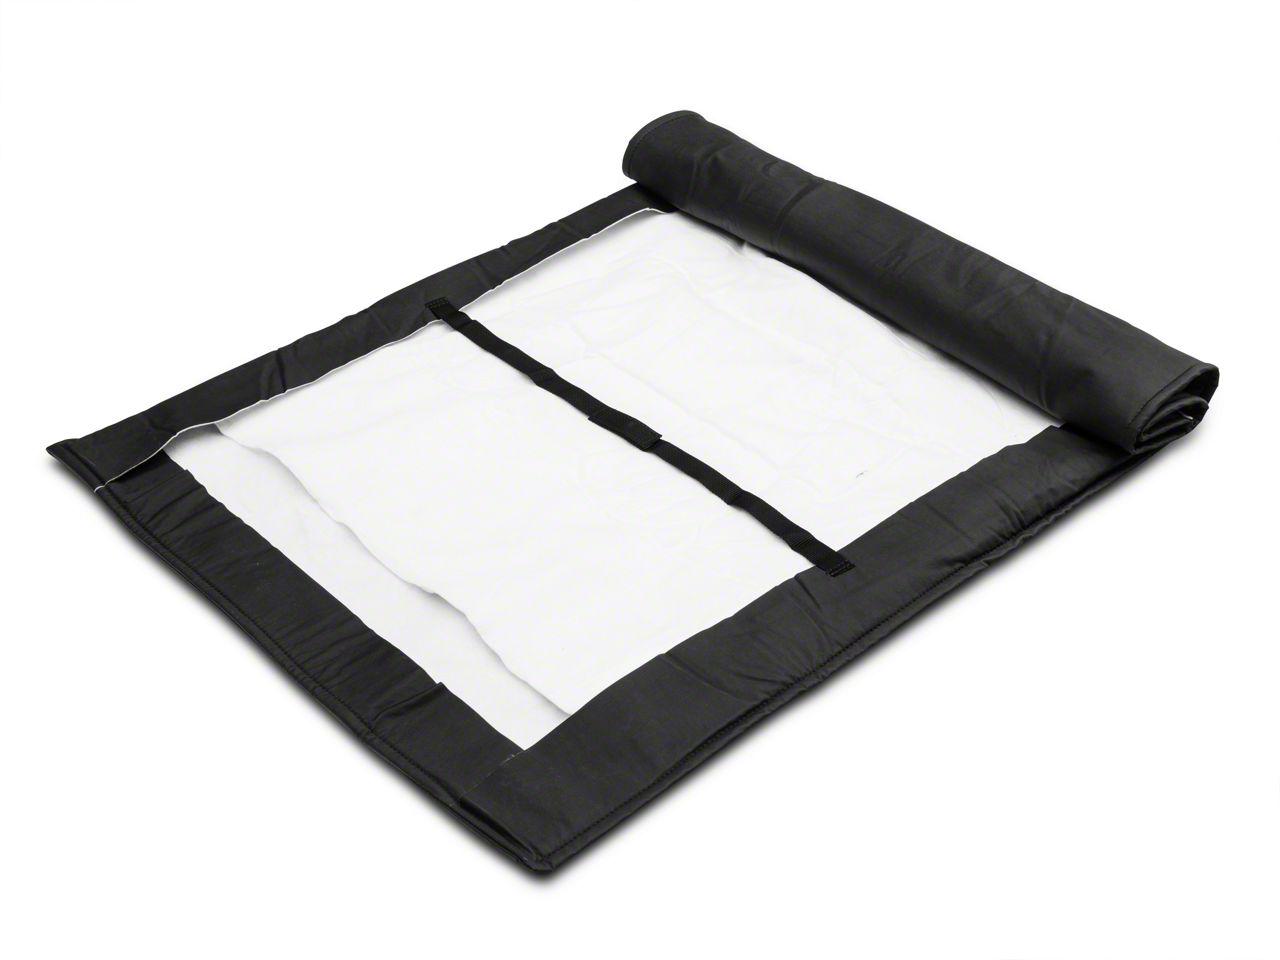 MasterTop Soft Top Protection Window Roll - Black (87-18 Jeep Wrangler YJ, TJ, & JK)